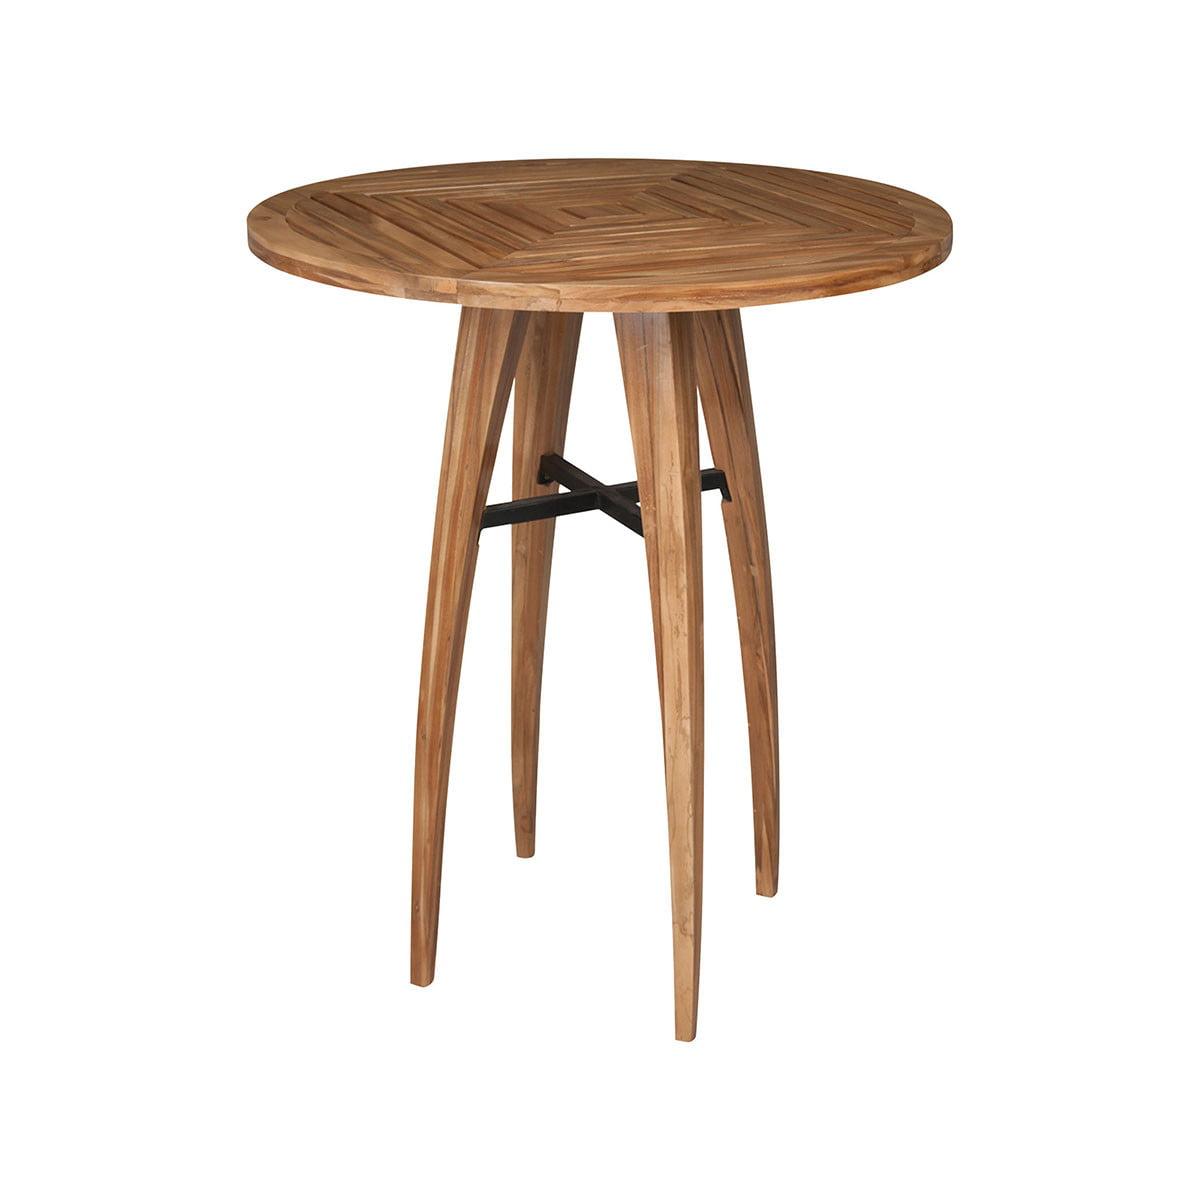 "GuildMaster 7117004ET Teak Wood 36"" Wide Teak Wood Pub Table by Guildmaster"